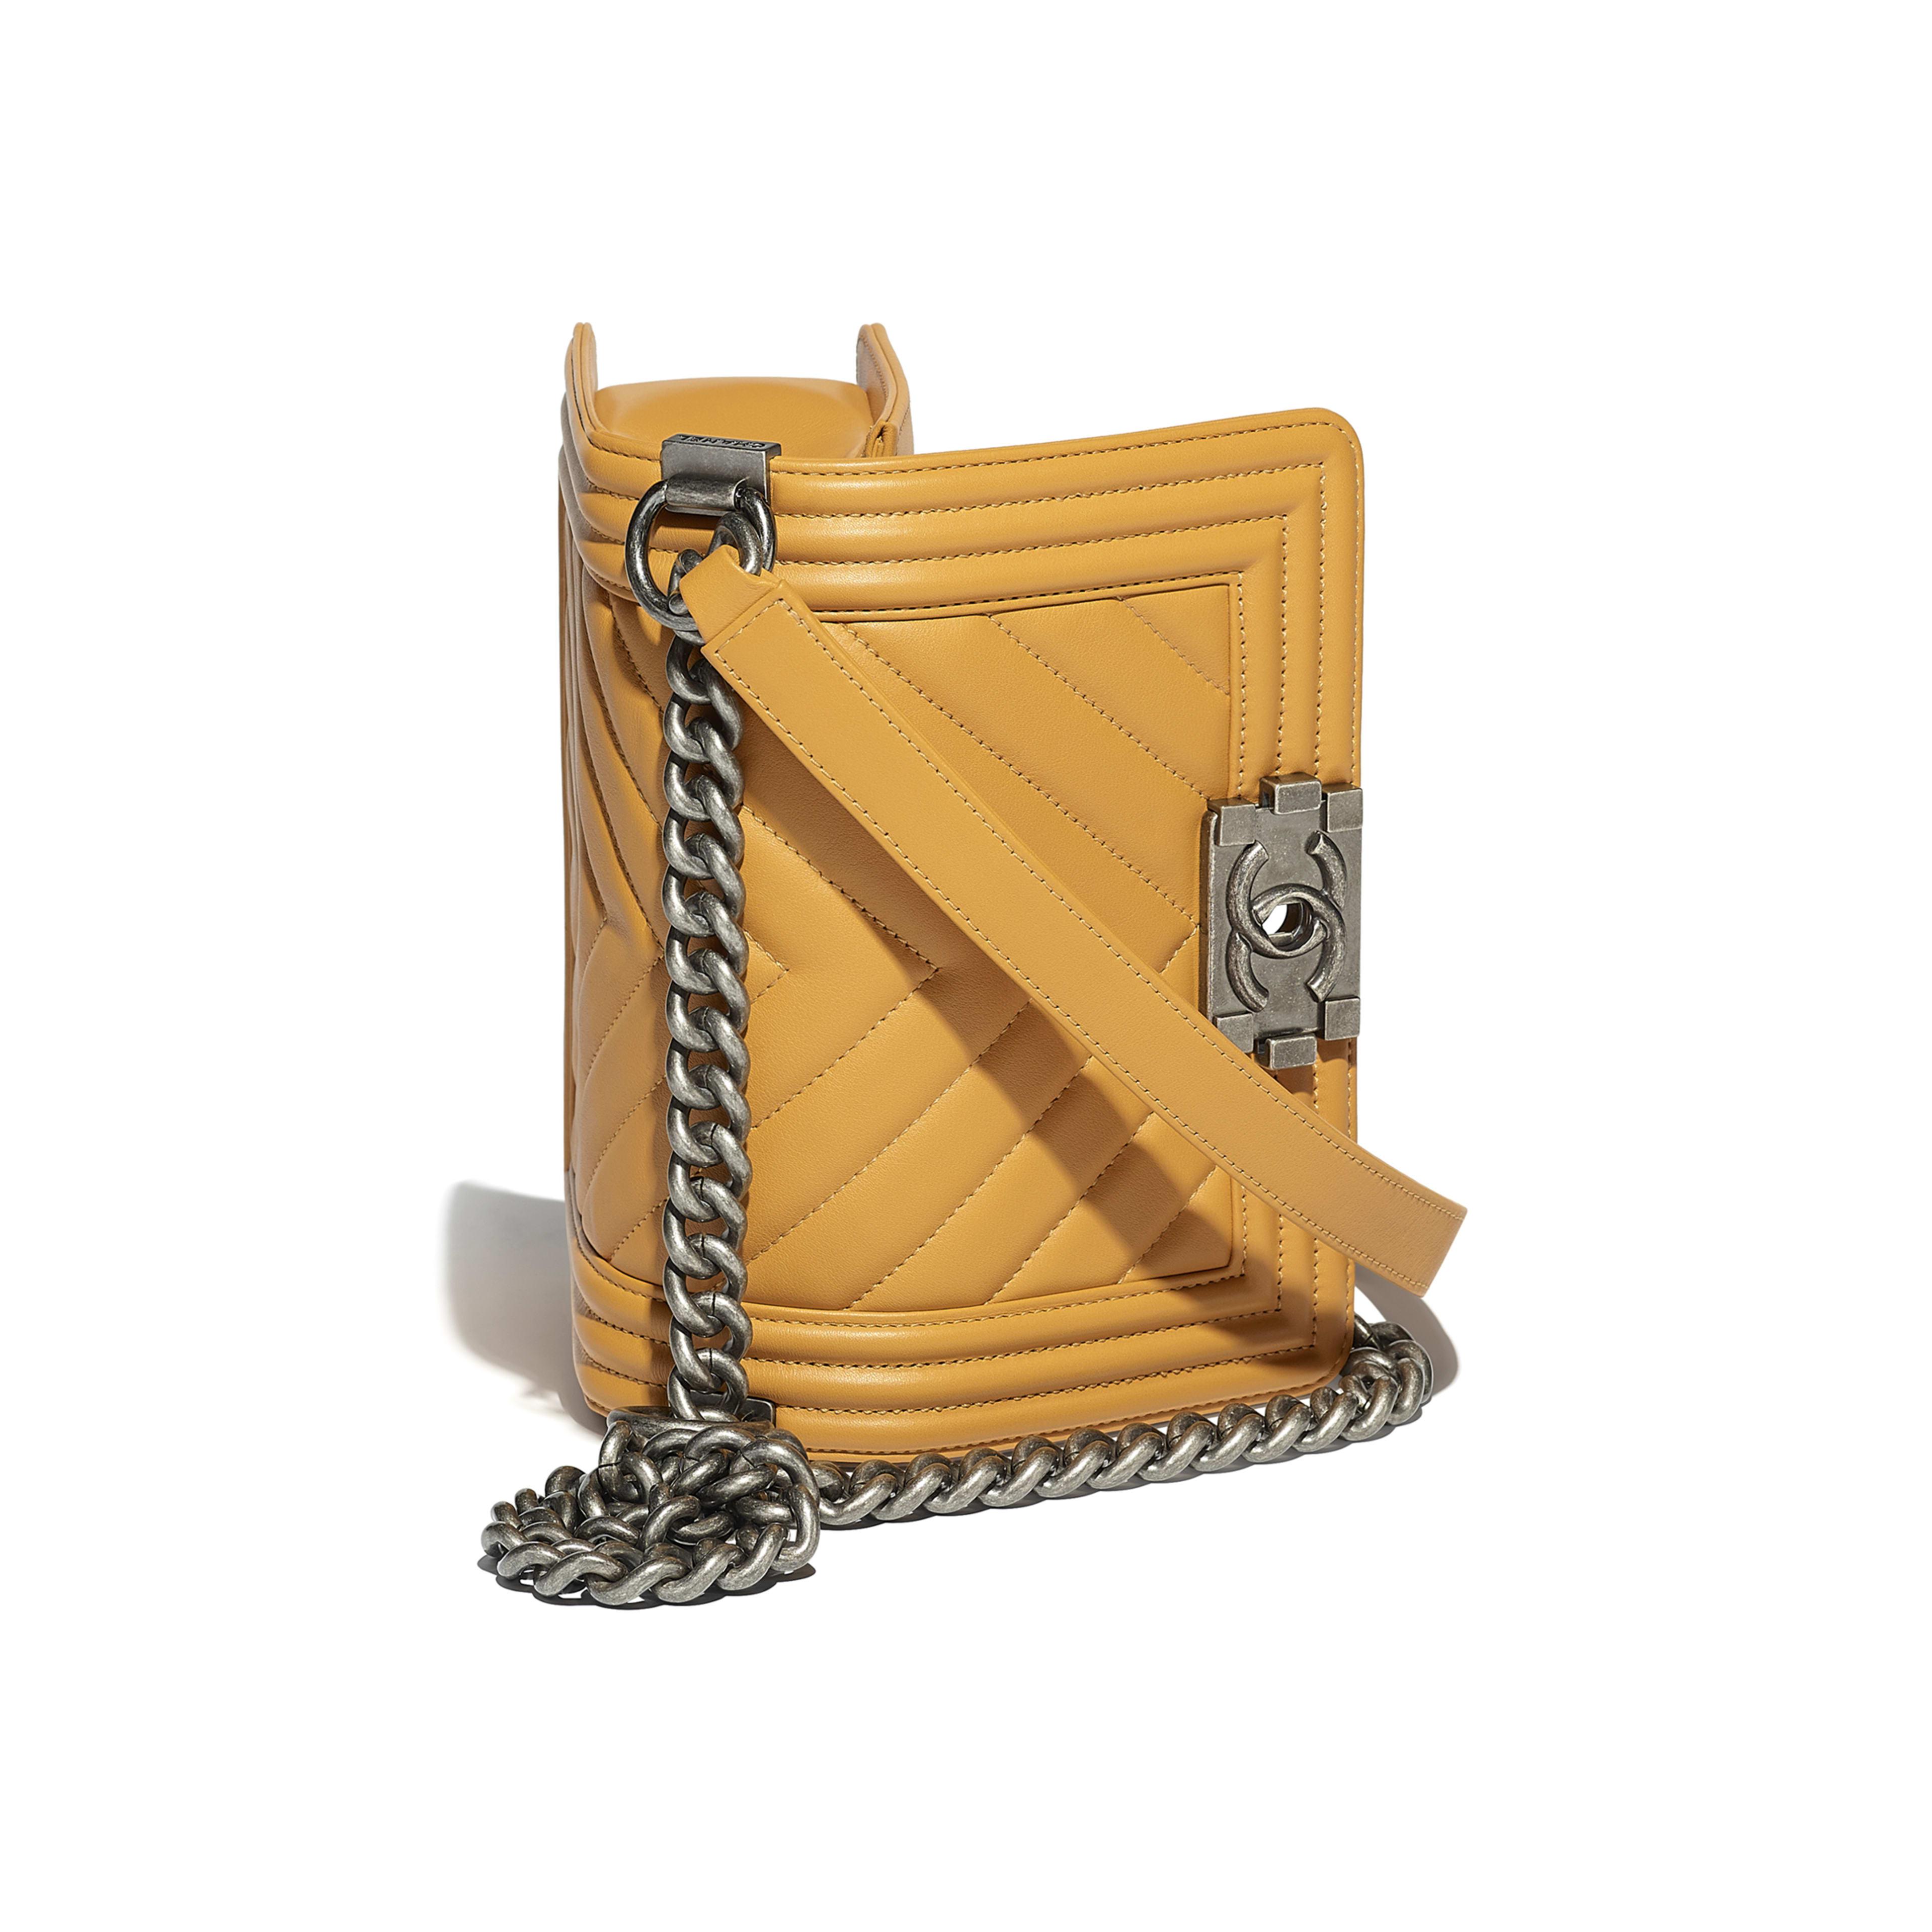 Small BOY CHANEL Handbag Calfskin & Ruthenium-Finish Metal Yellow -                                            view 3 - see full sized version